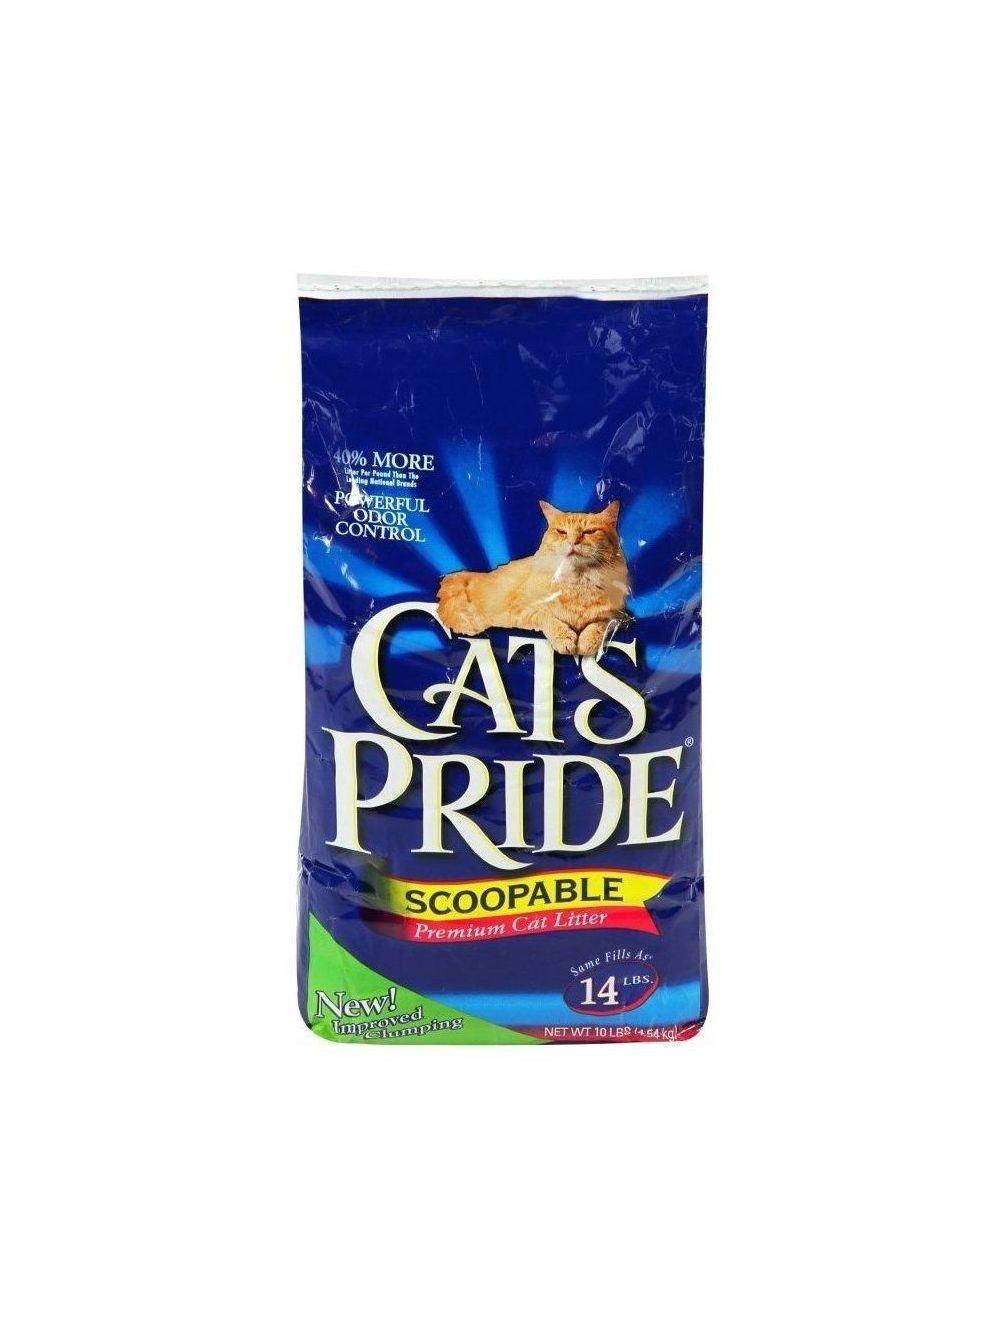 Cats Pride Premium Cat Litter Scoopable 6.35 kg